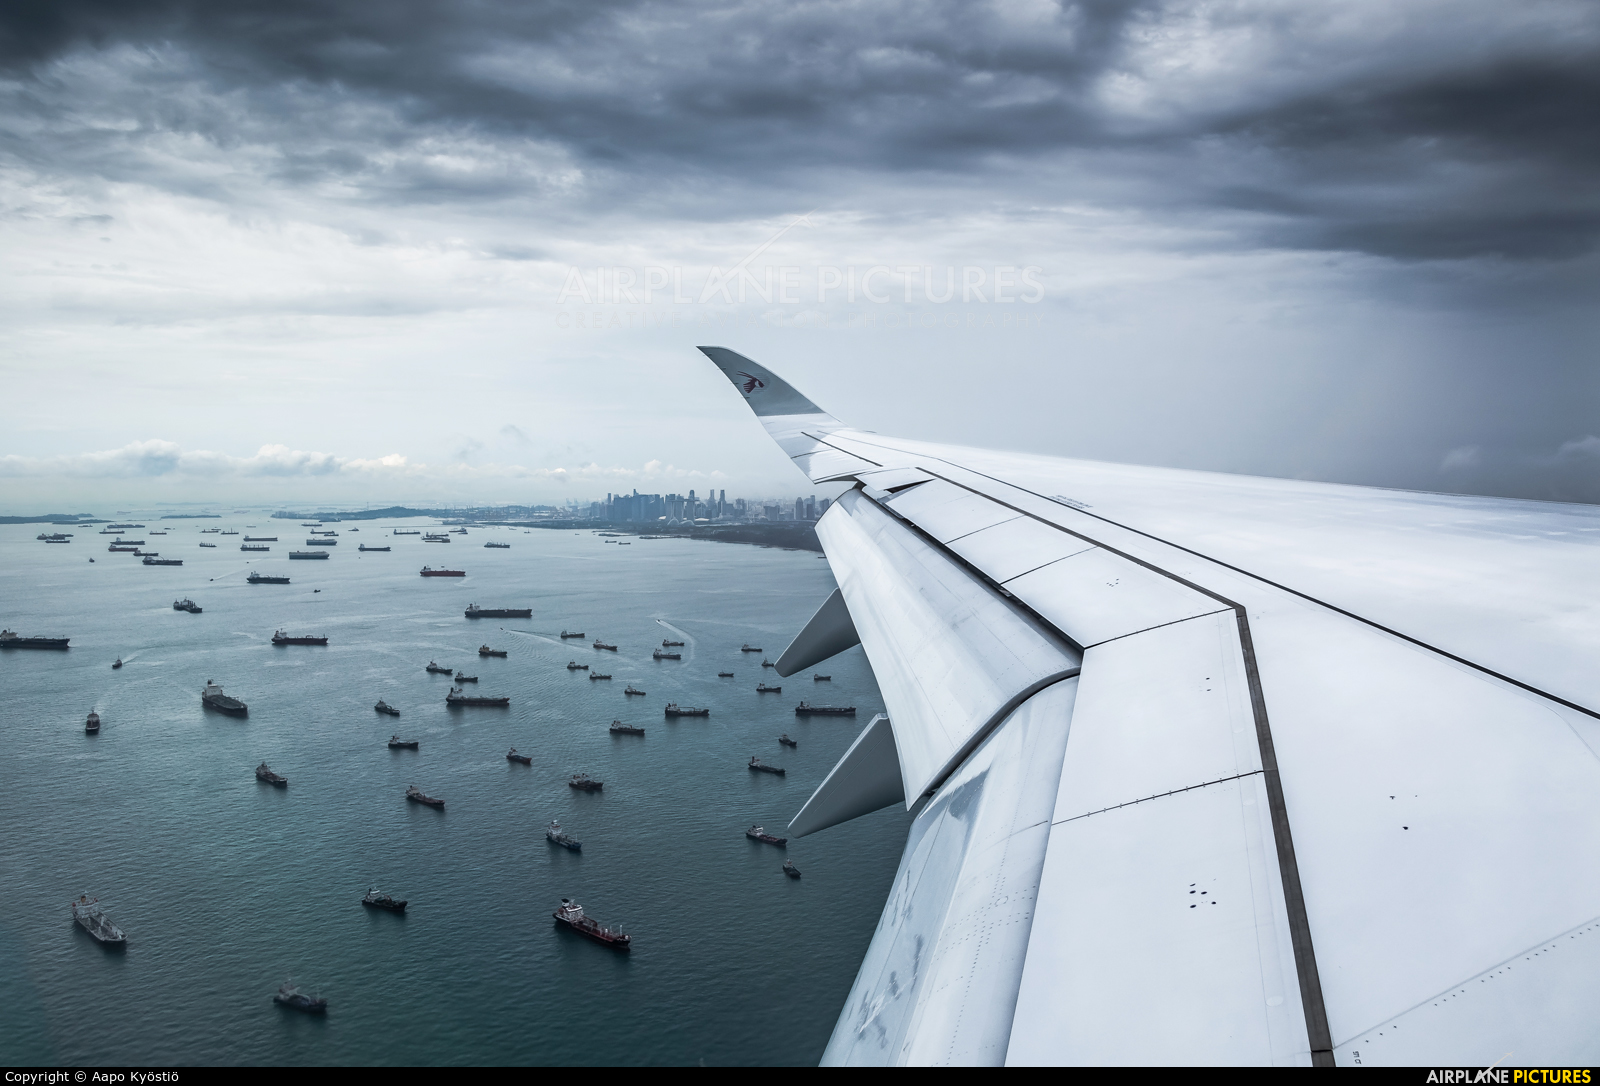 Qatar Airways - aircraft at In Flight - Singapore